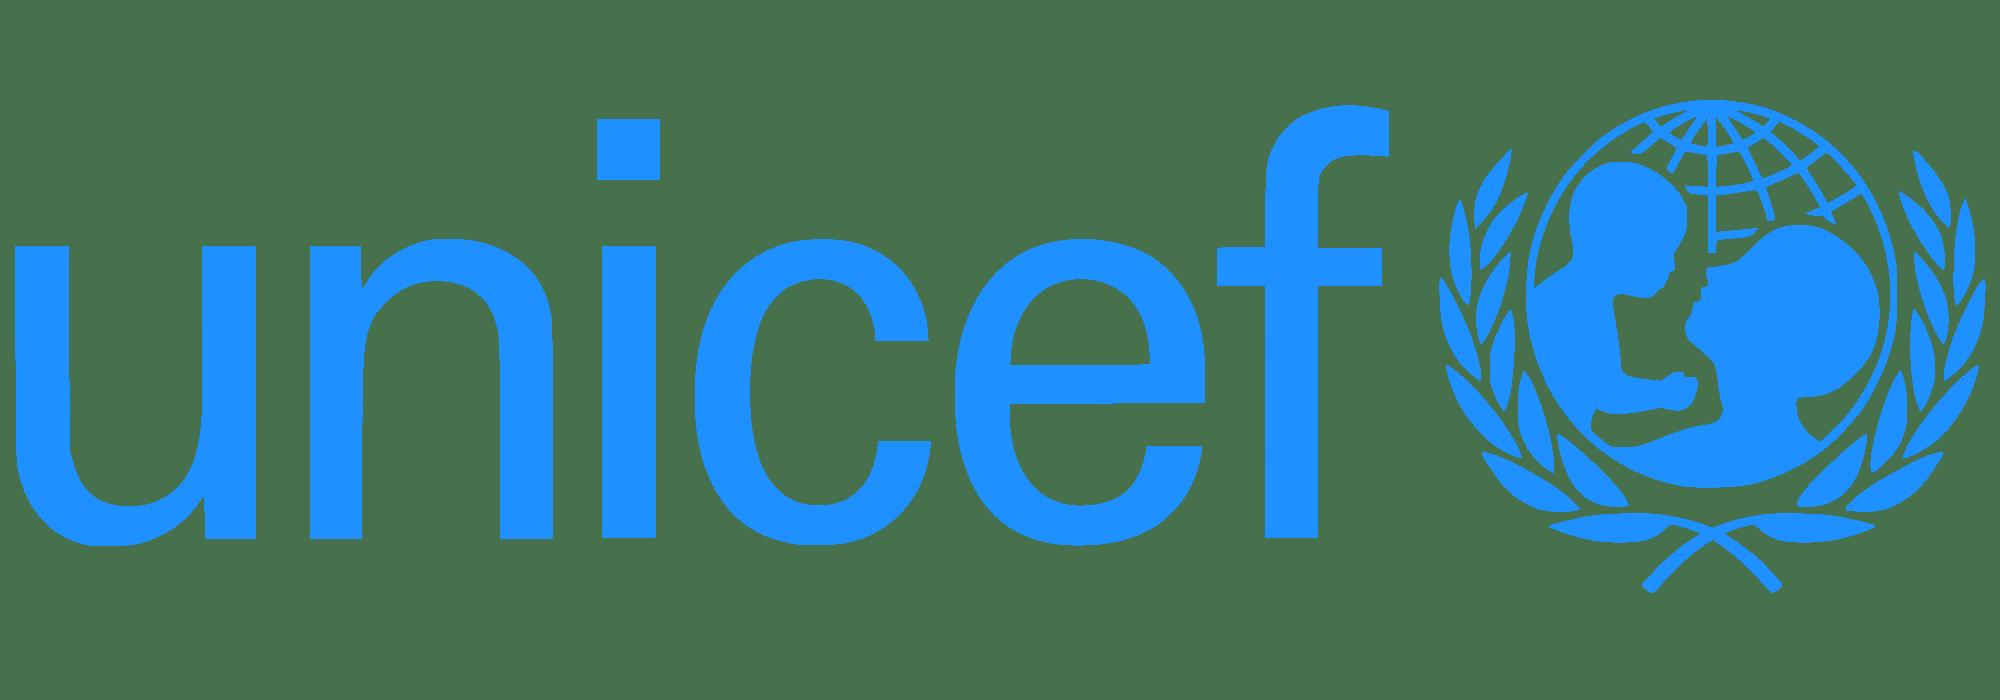 https://www.unicef.org/